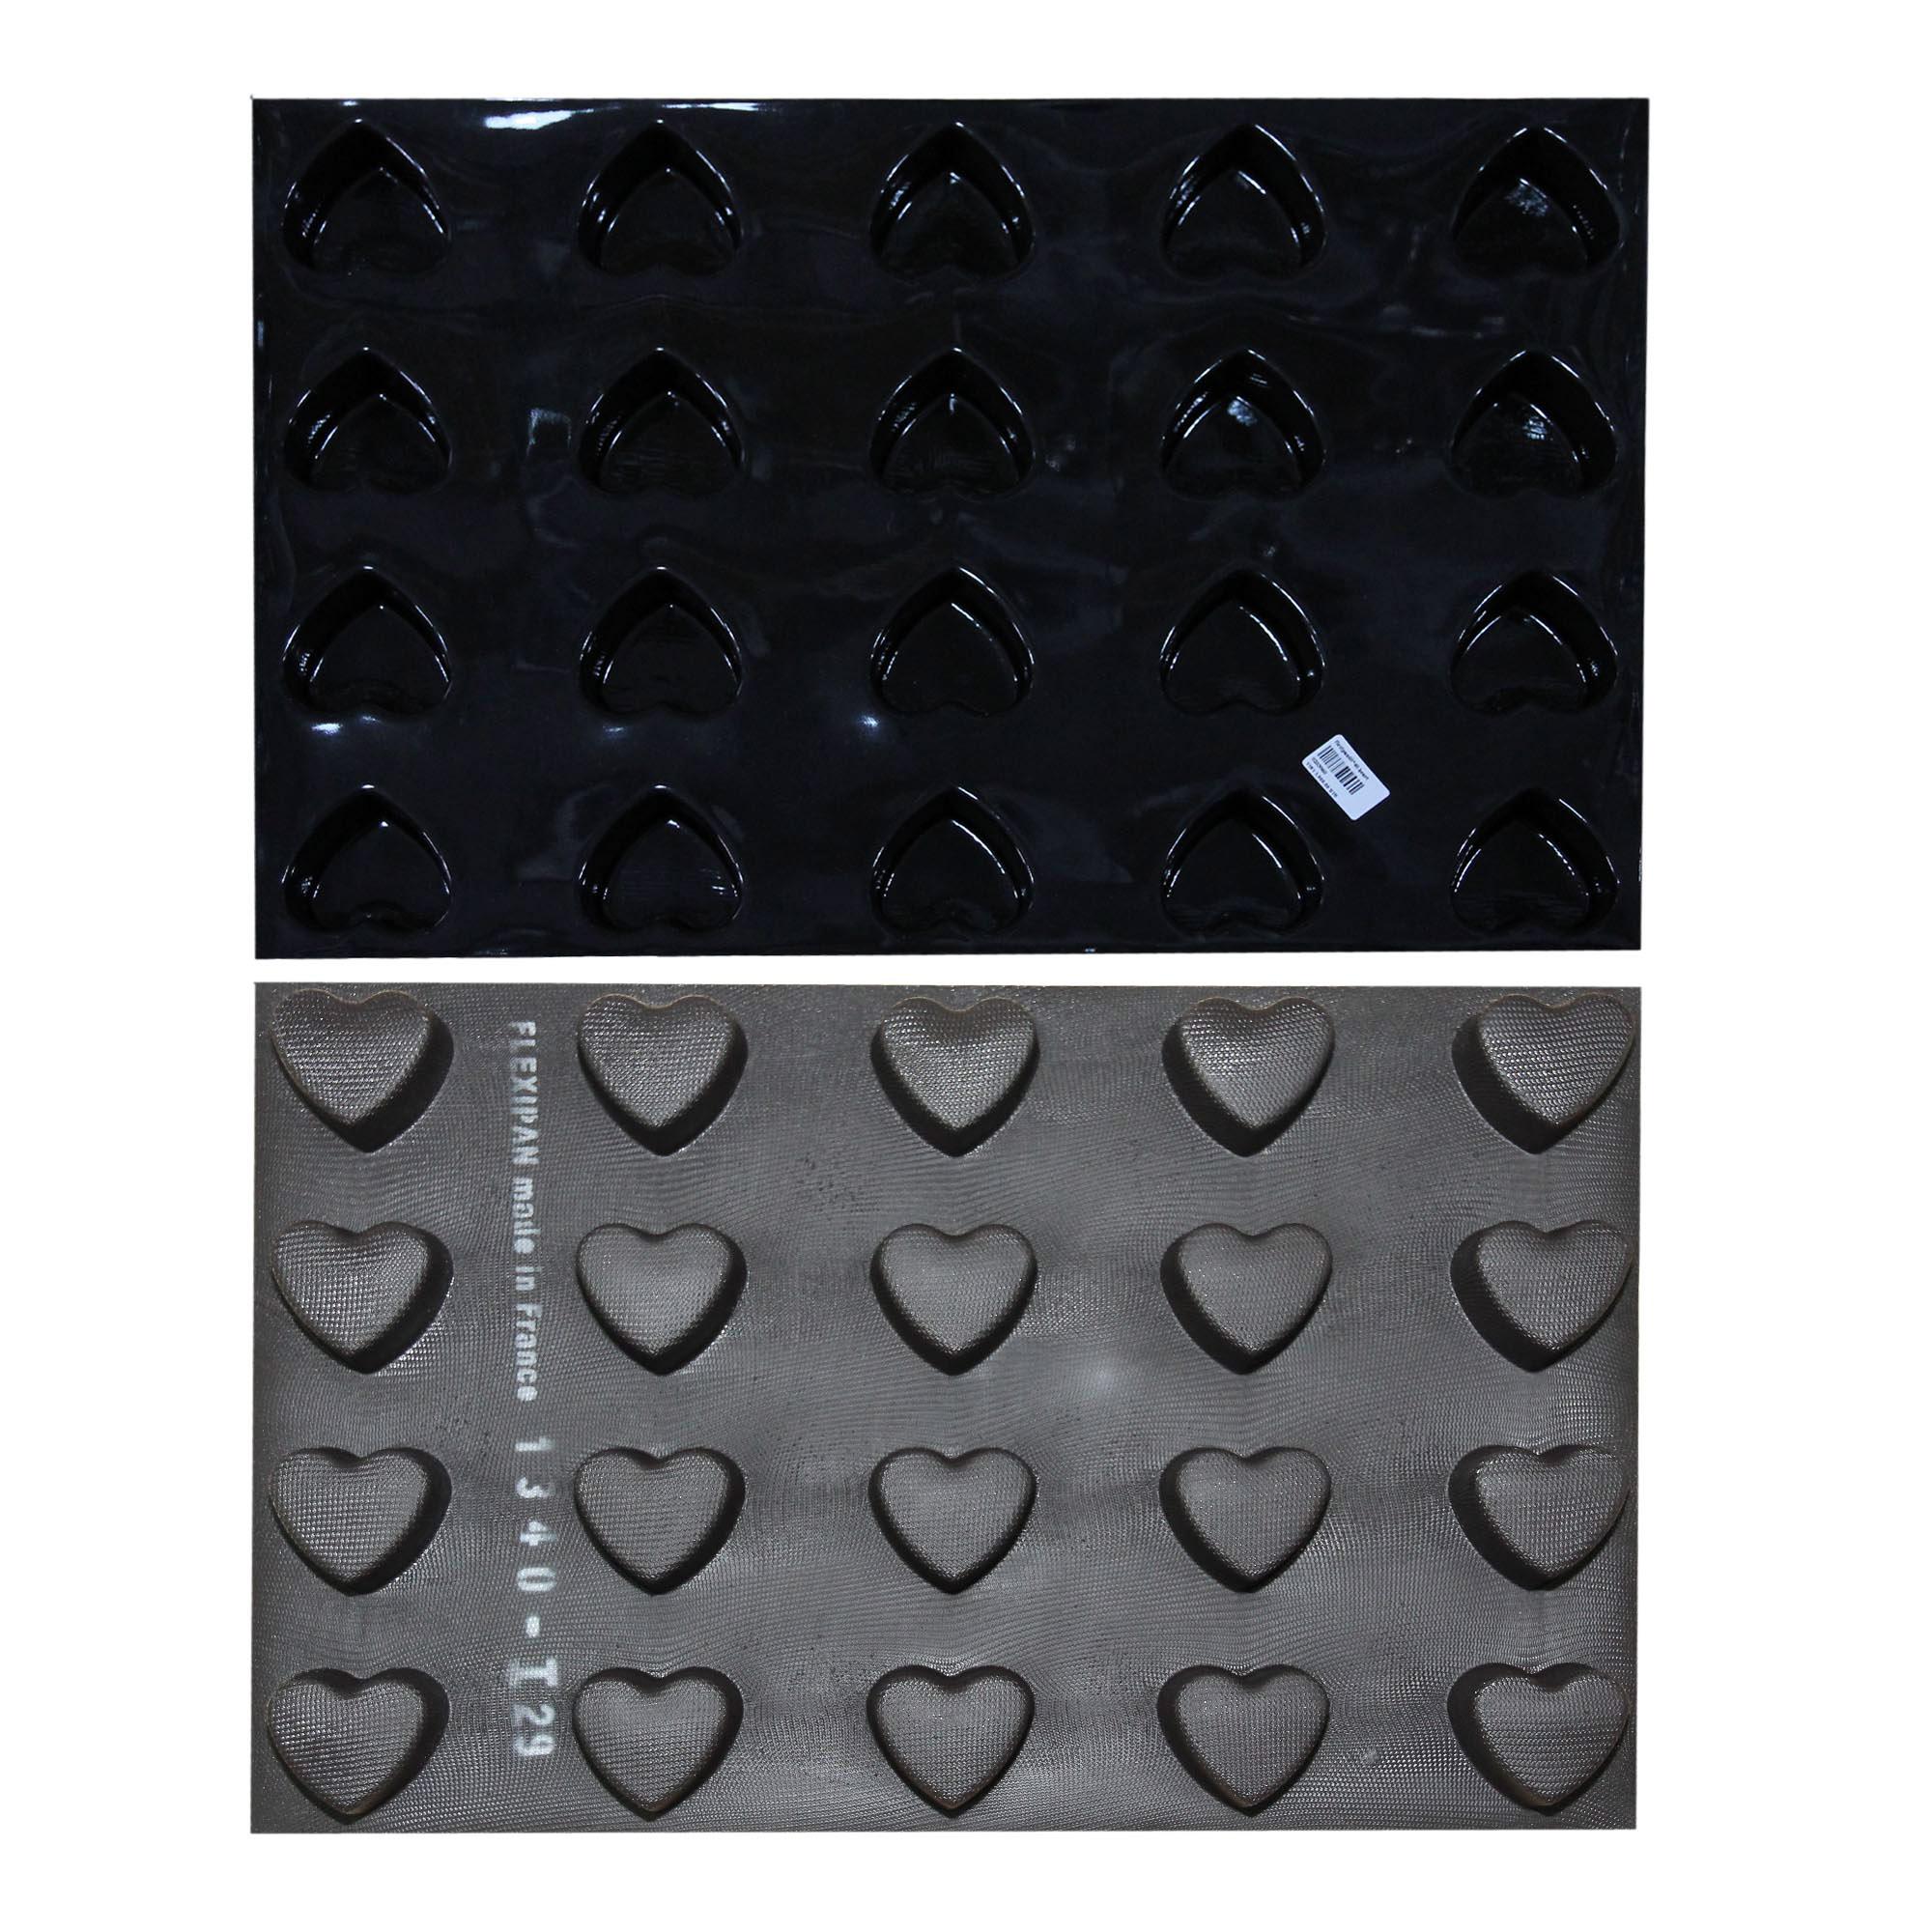 Demarle flexipan 60x40 heart